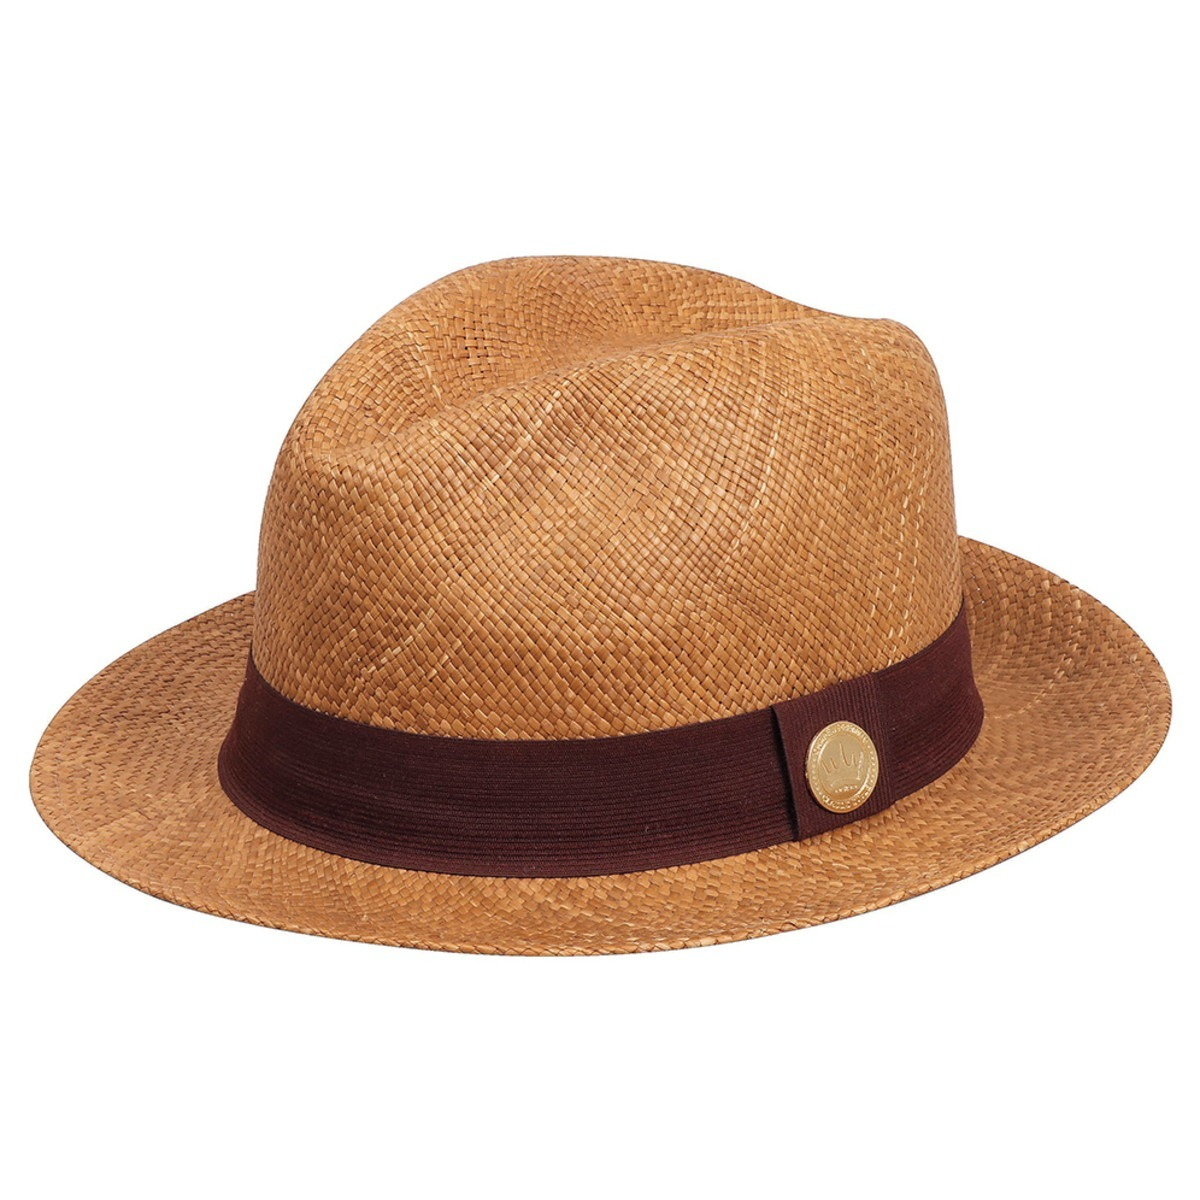 Chapéu Panamá Toquilla Tabaco Aba 5cm Com F  Marrom Oferta ! - R  345 4acad6df3e8